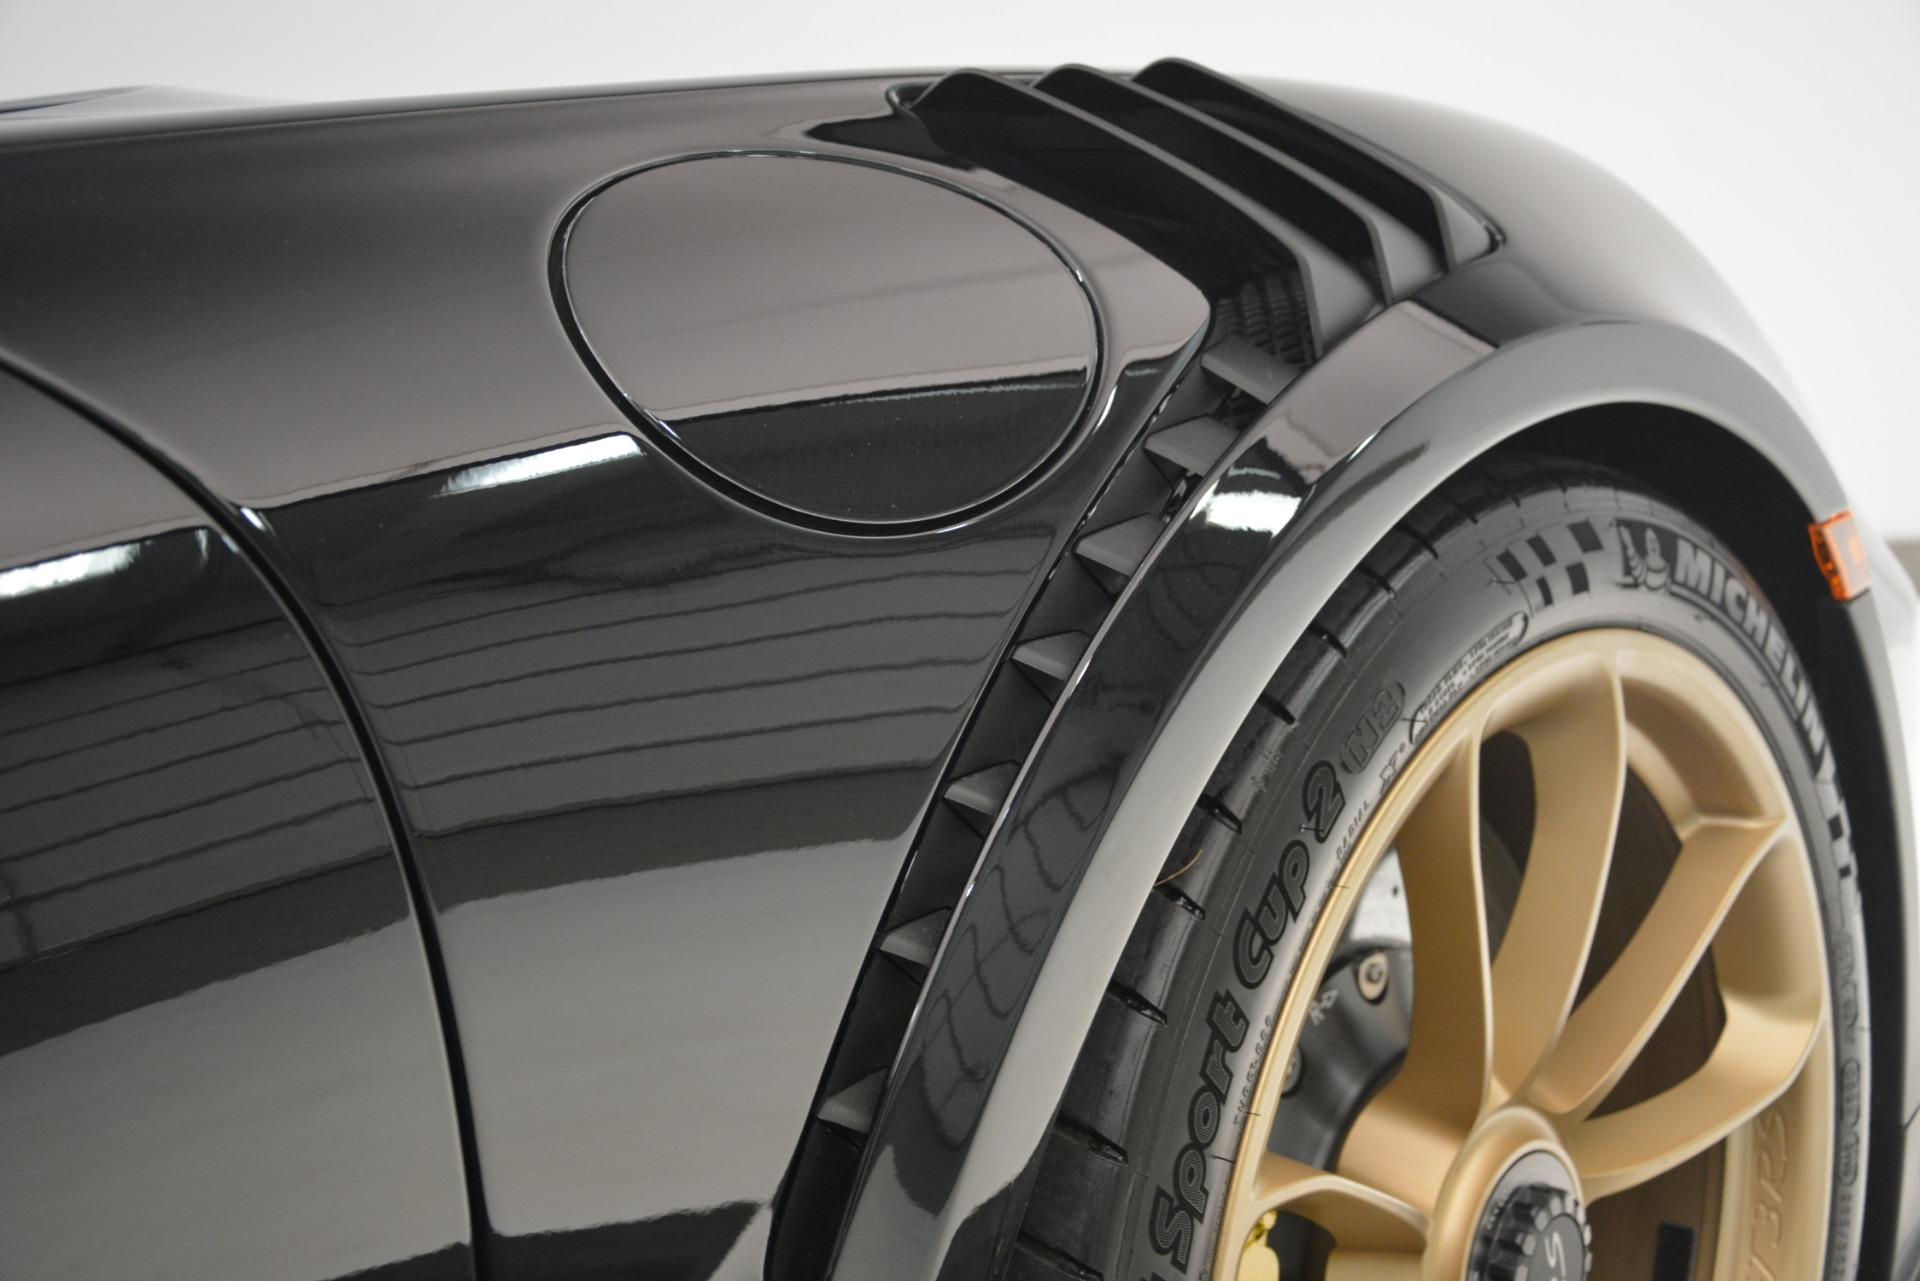 Used 2019 Porsche 911 GT3 RS For Sale In Westport, CT 3231_p28